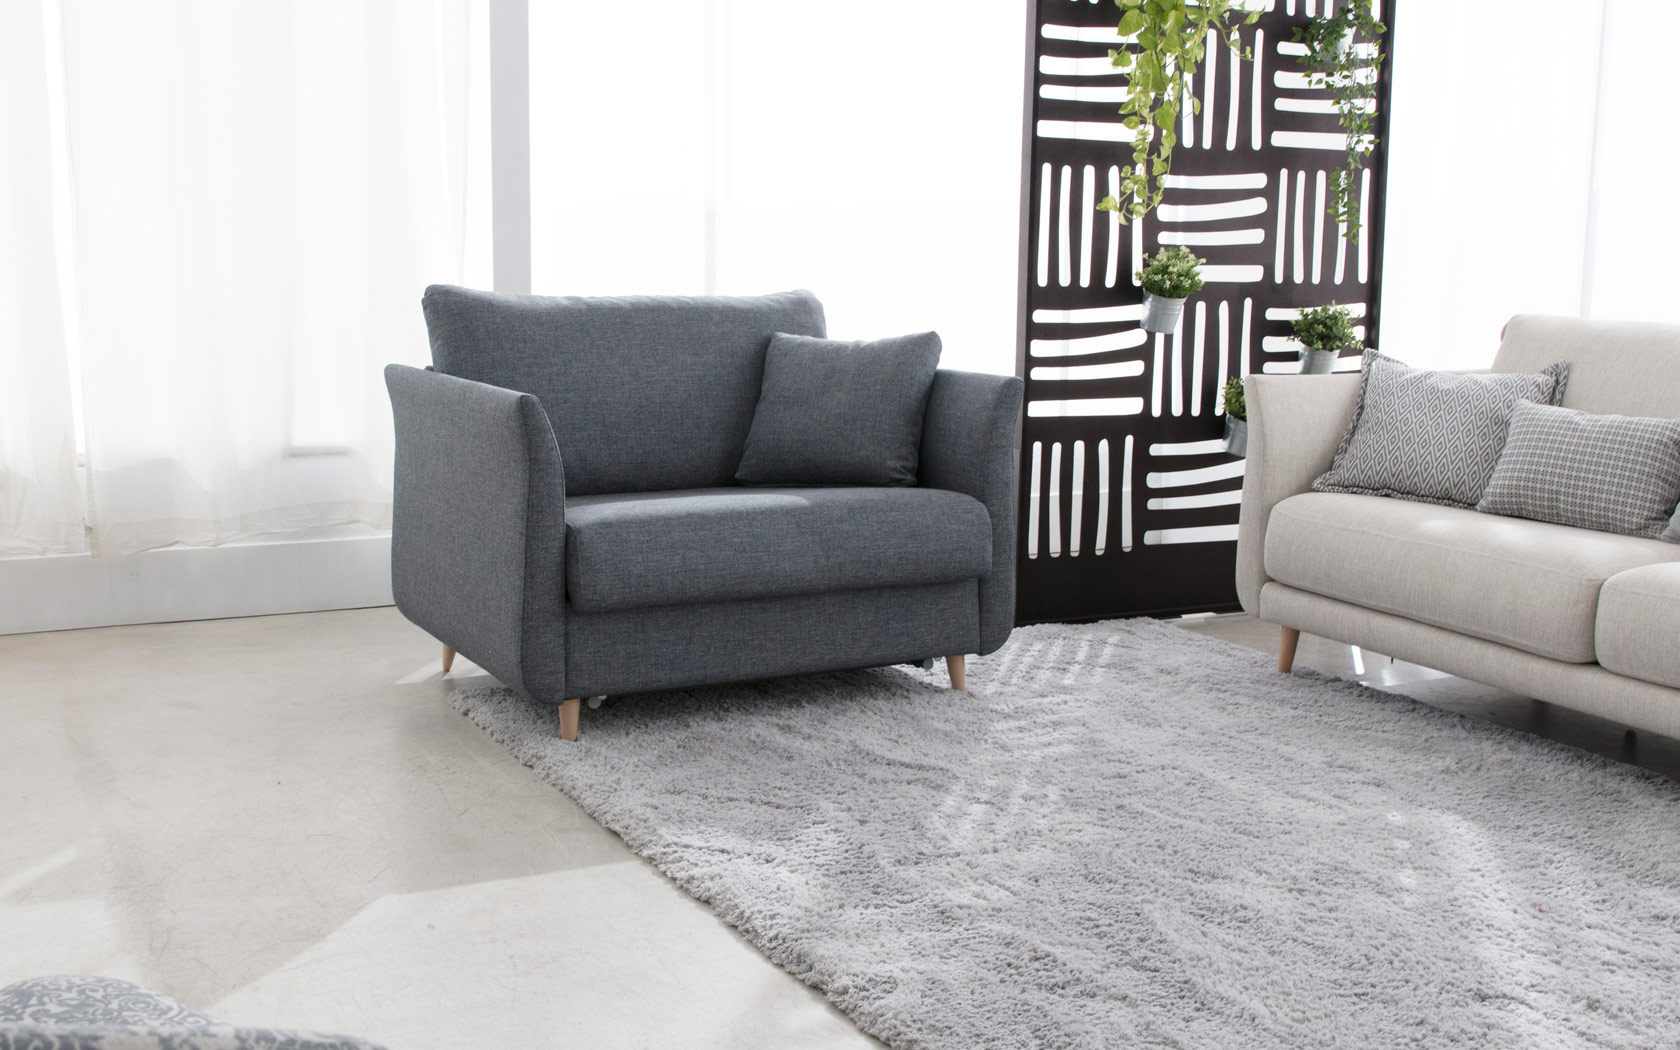 Helsinki sillón cama 2020 08